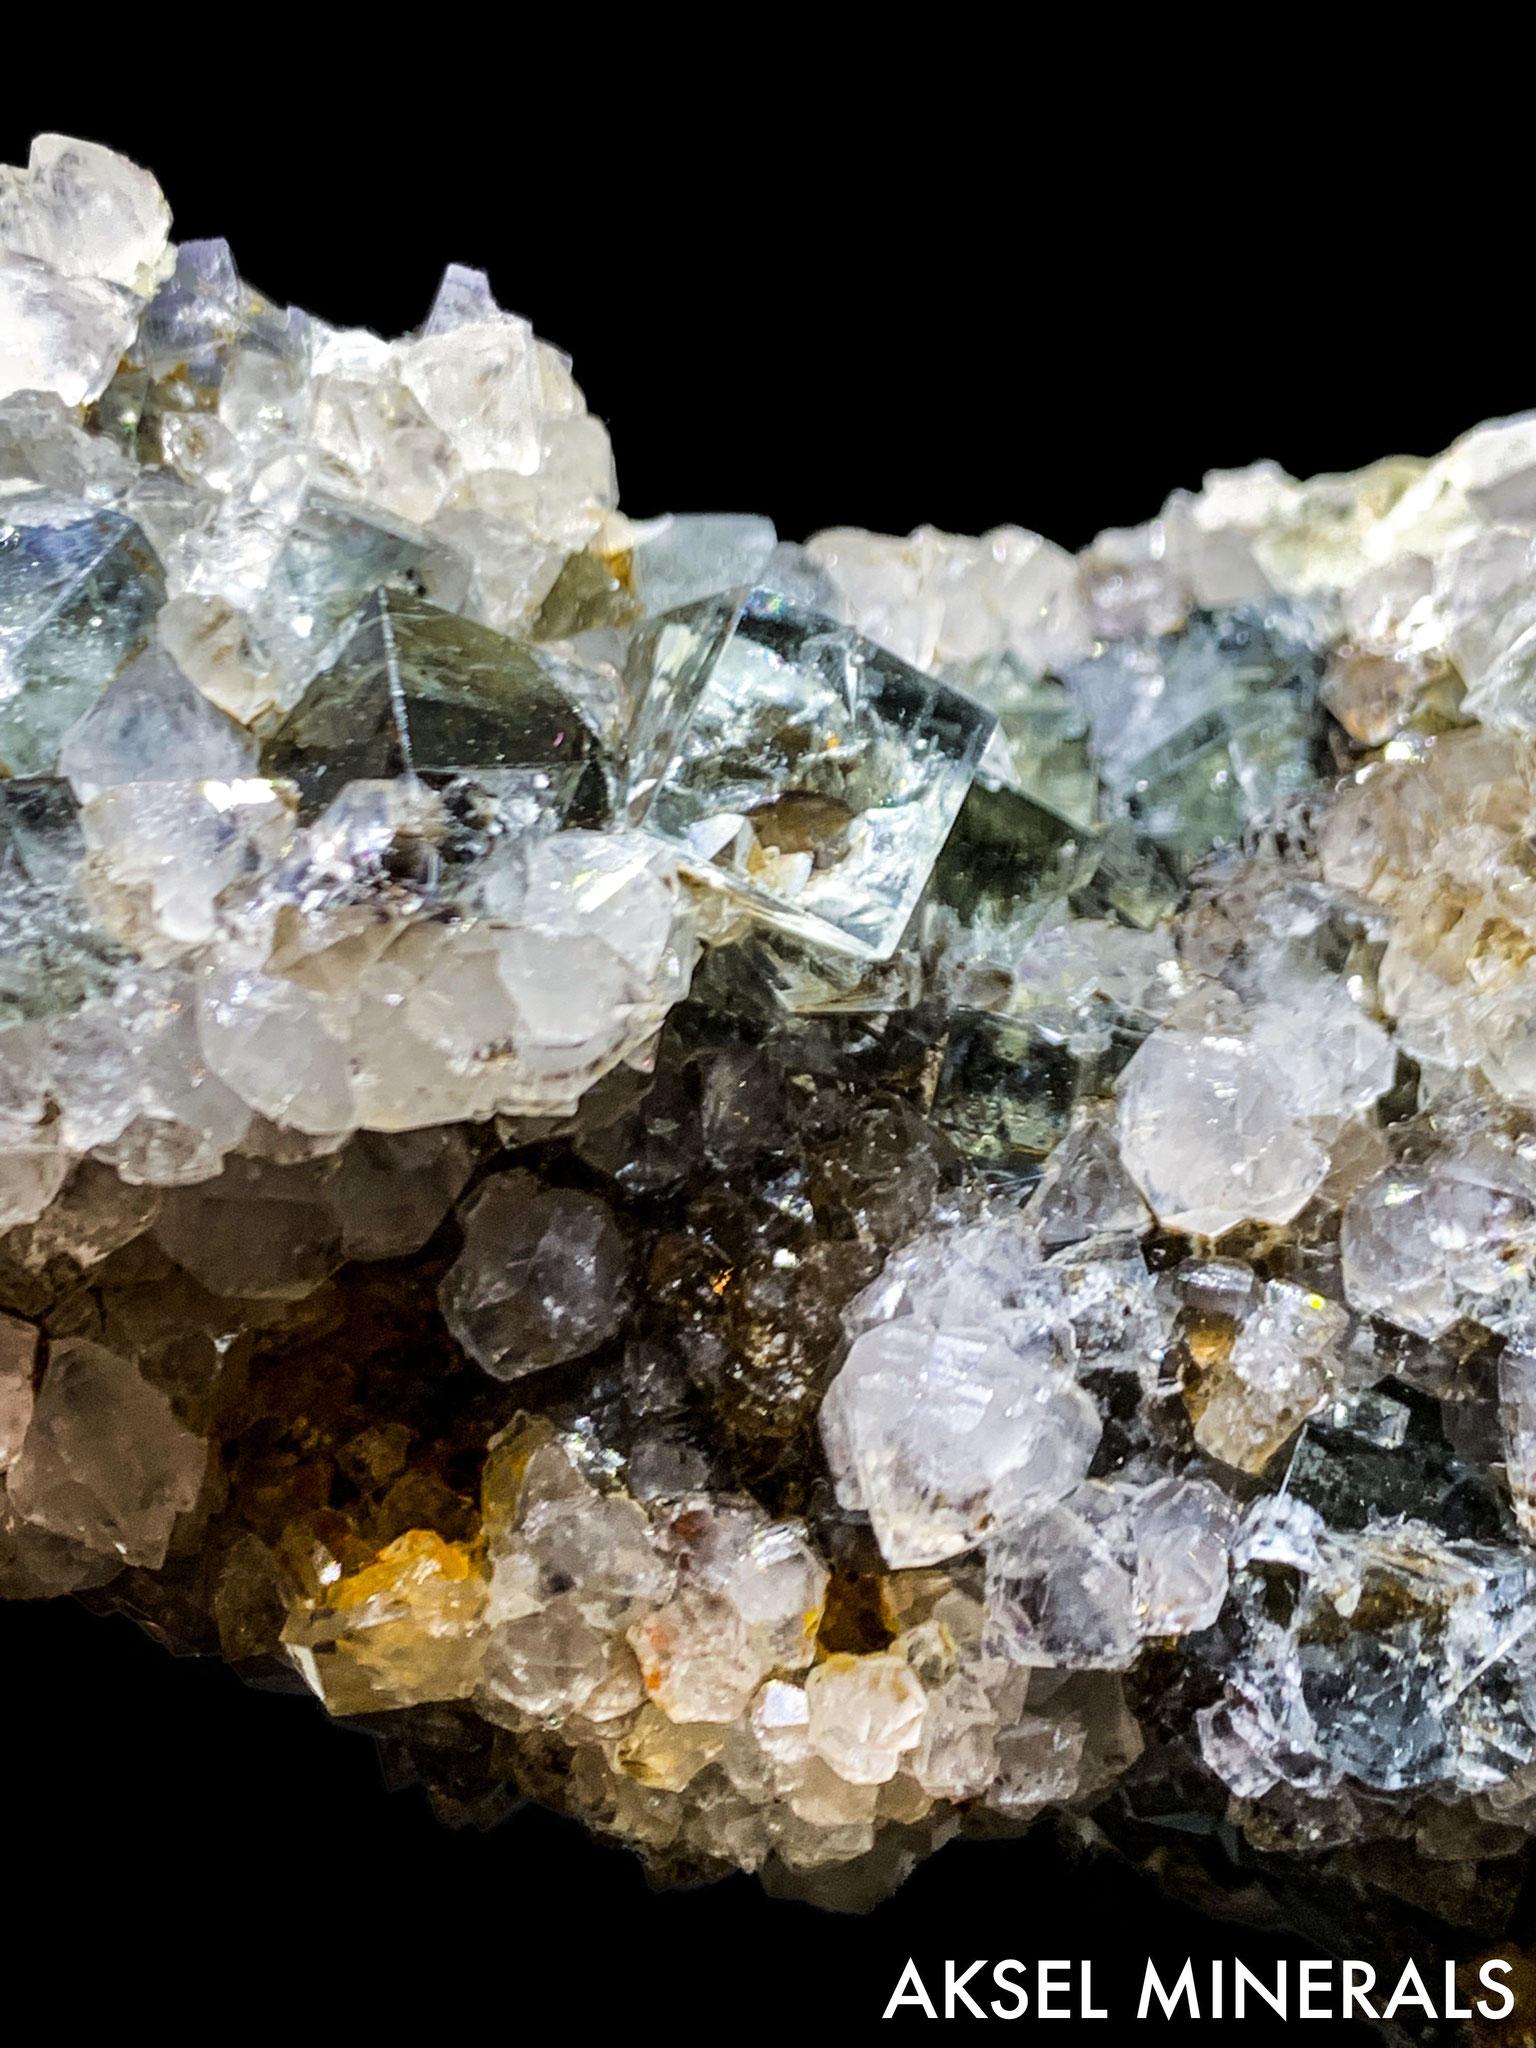 AM430 - Fluorite sur Quartz - Diana Maria Mine, Rogerley Quarry, Frosterley, Stanhope, Durham Co., England, UK